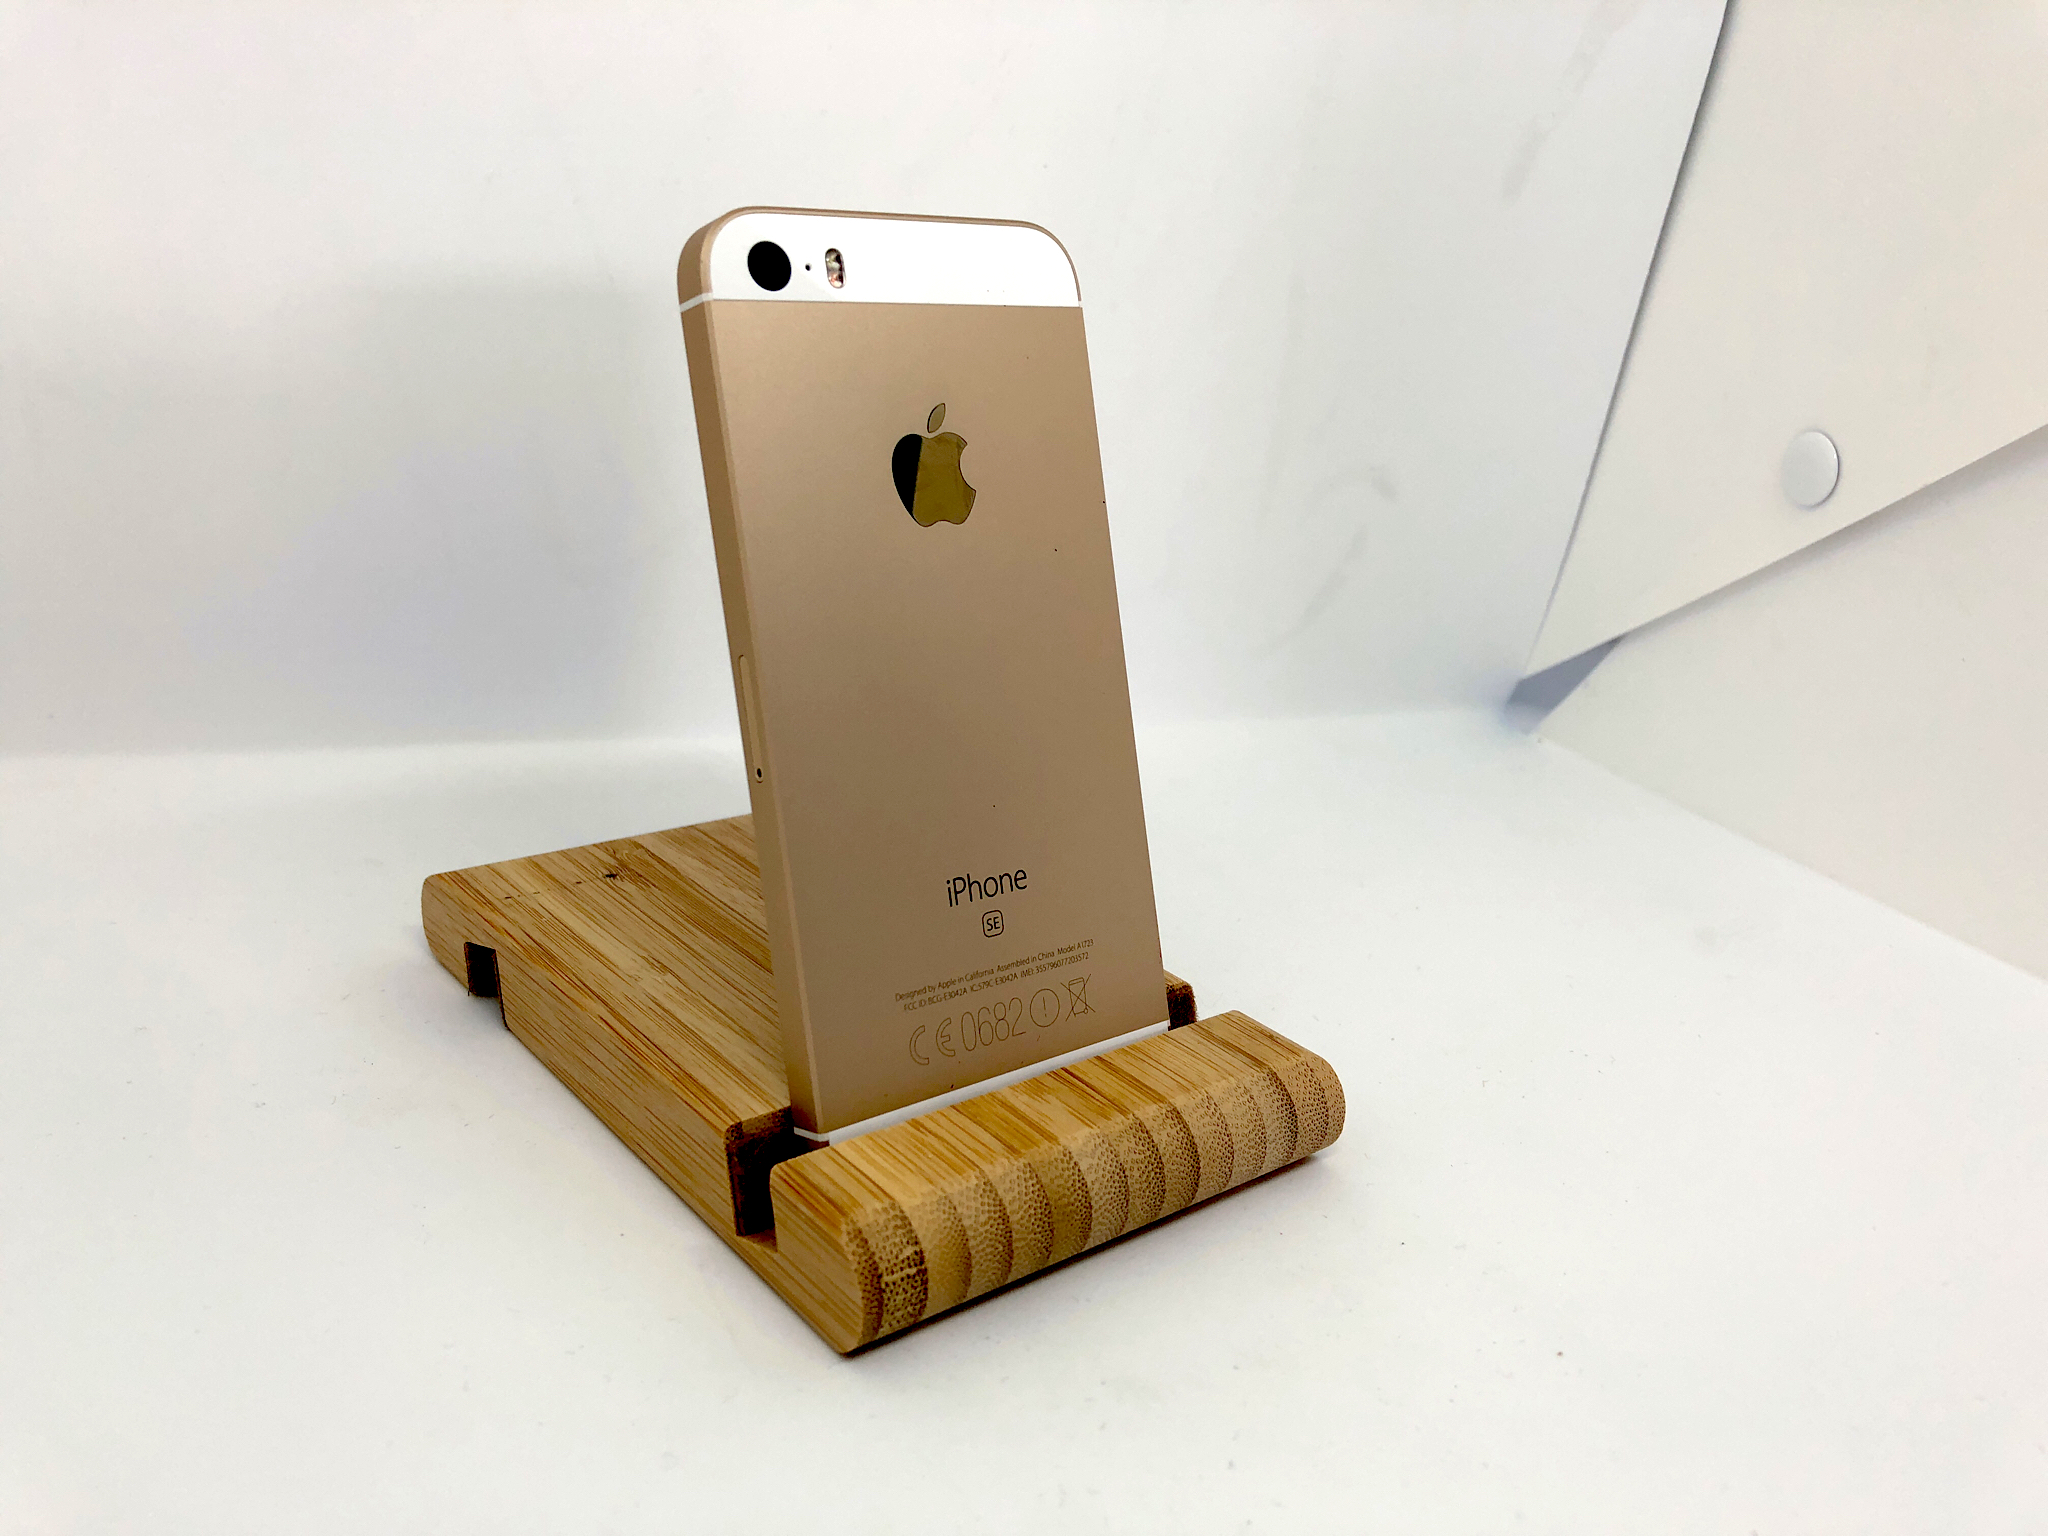 iPhone SE 16GB, 16 GB, Gold, Afbeelding 2